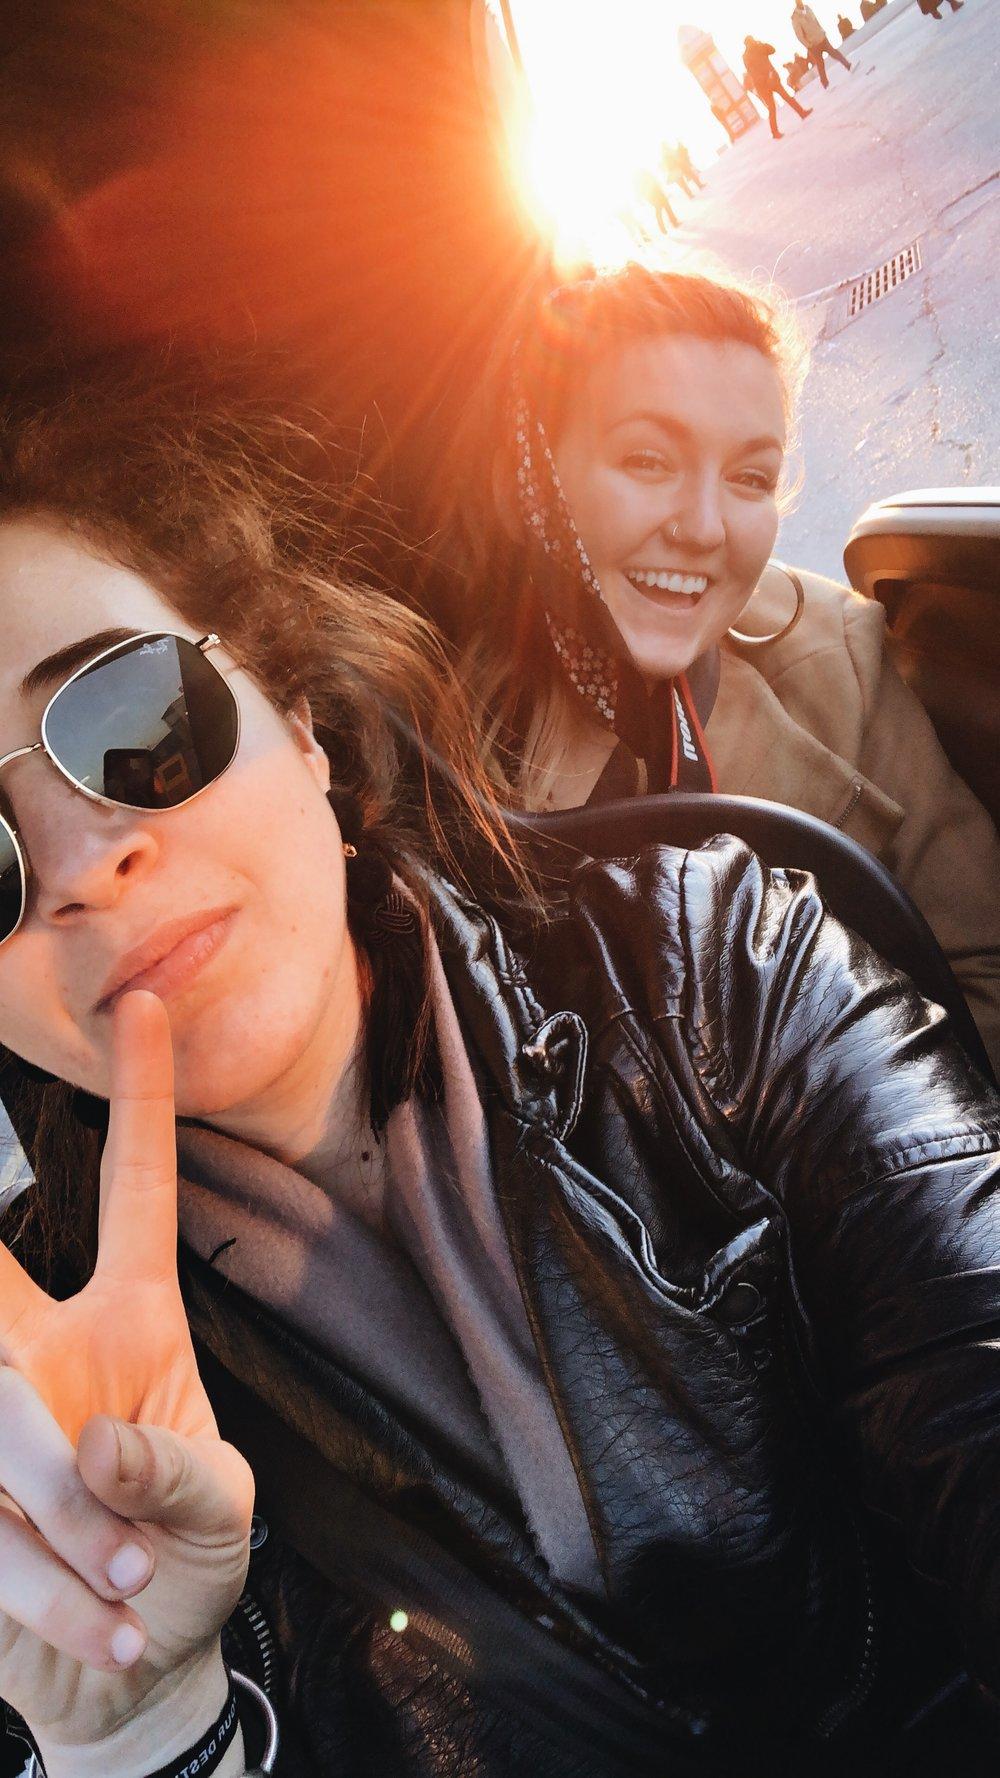 a car selfie for good measure